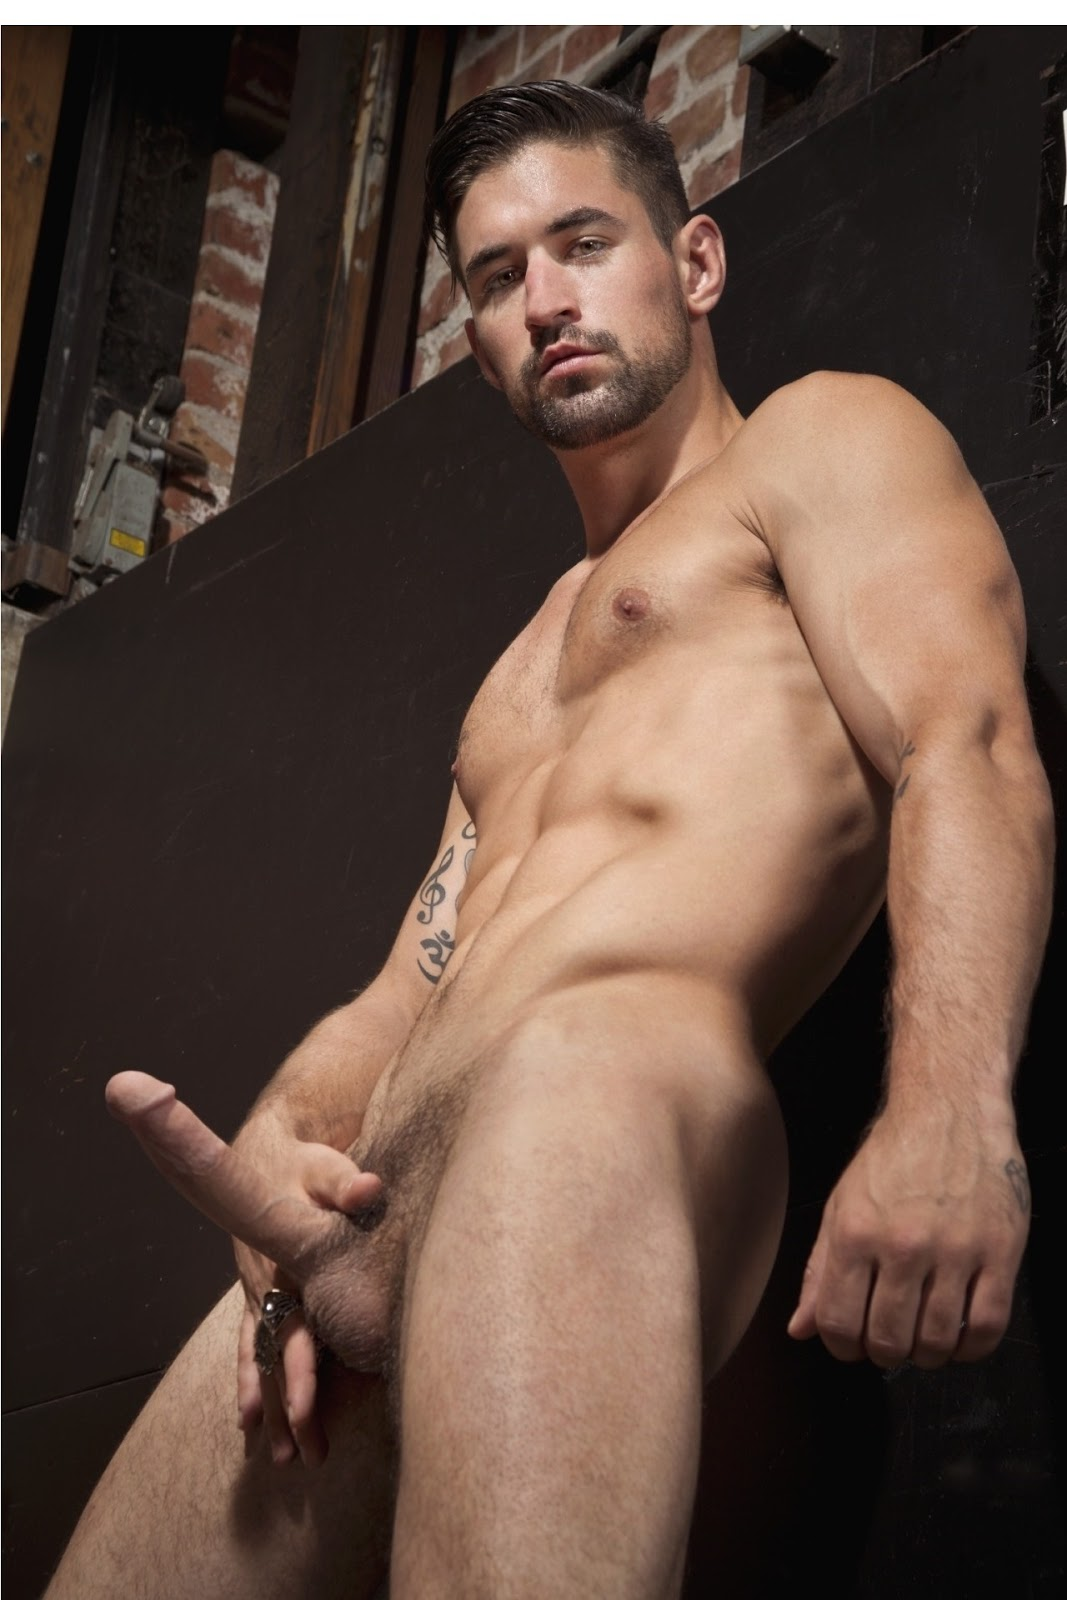 Nude male models sex